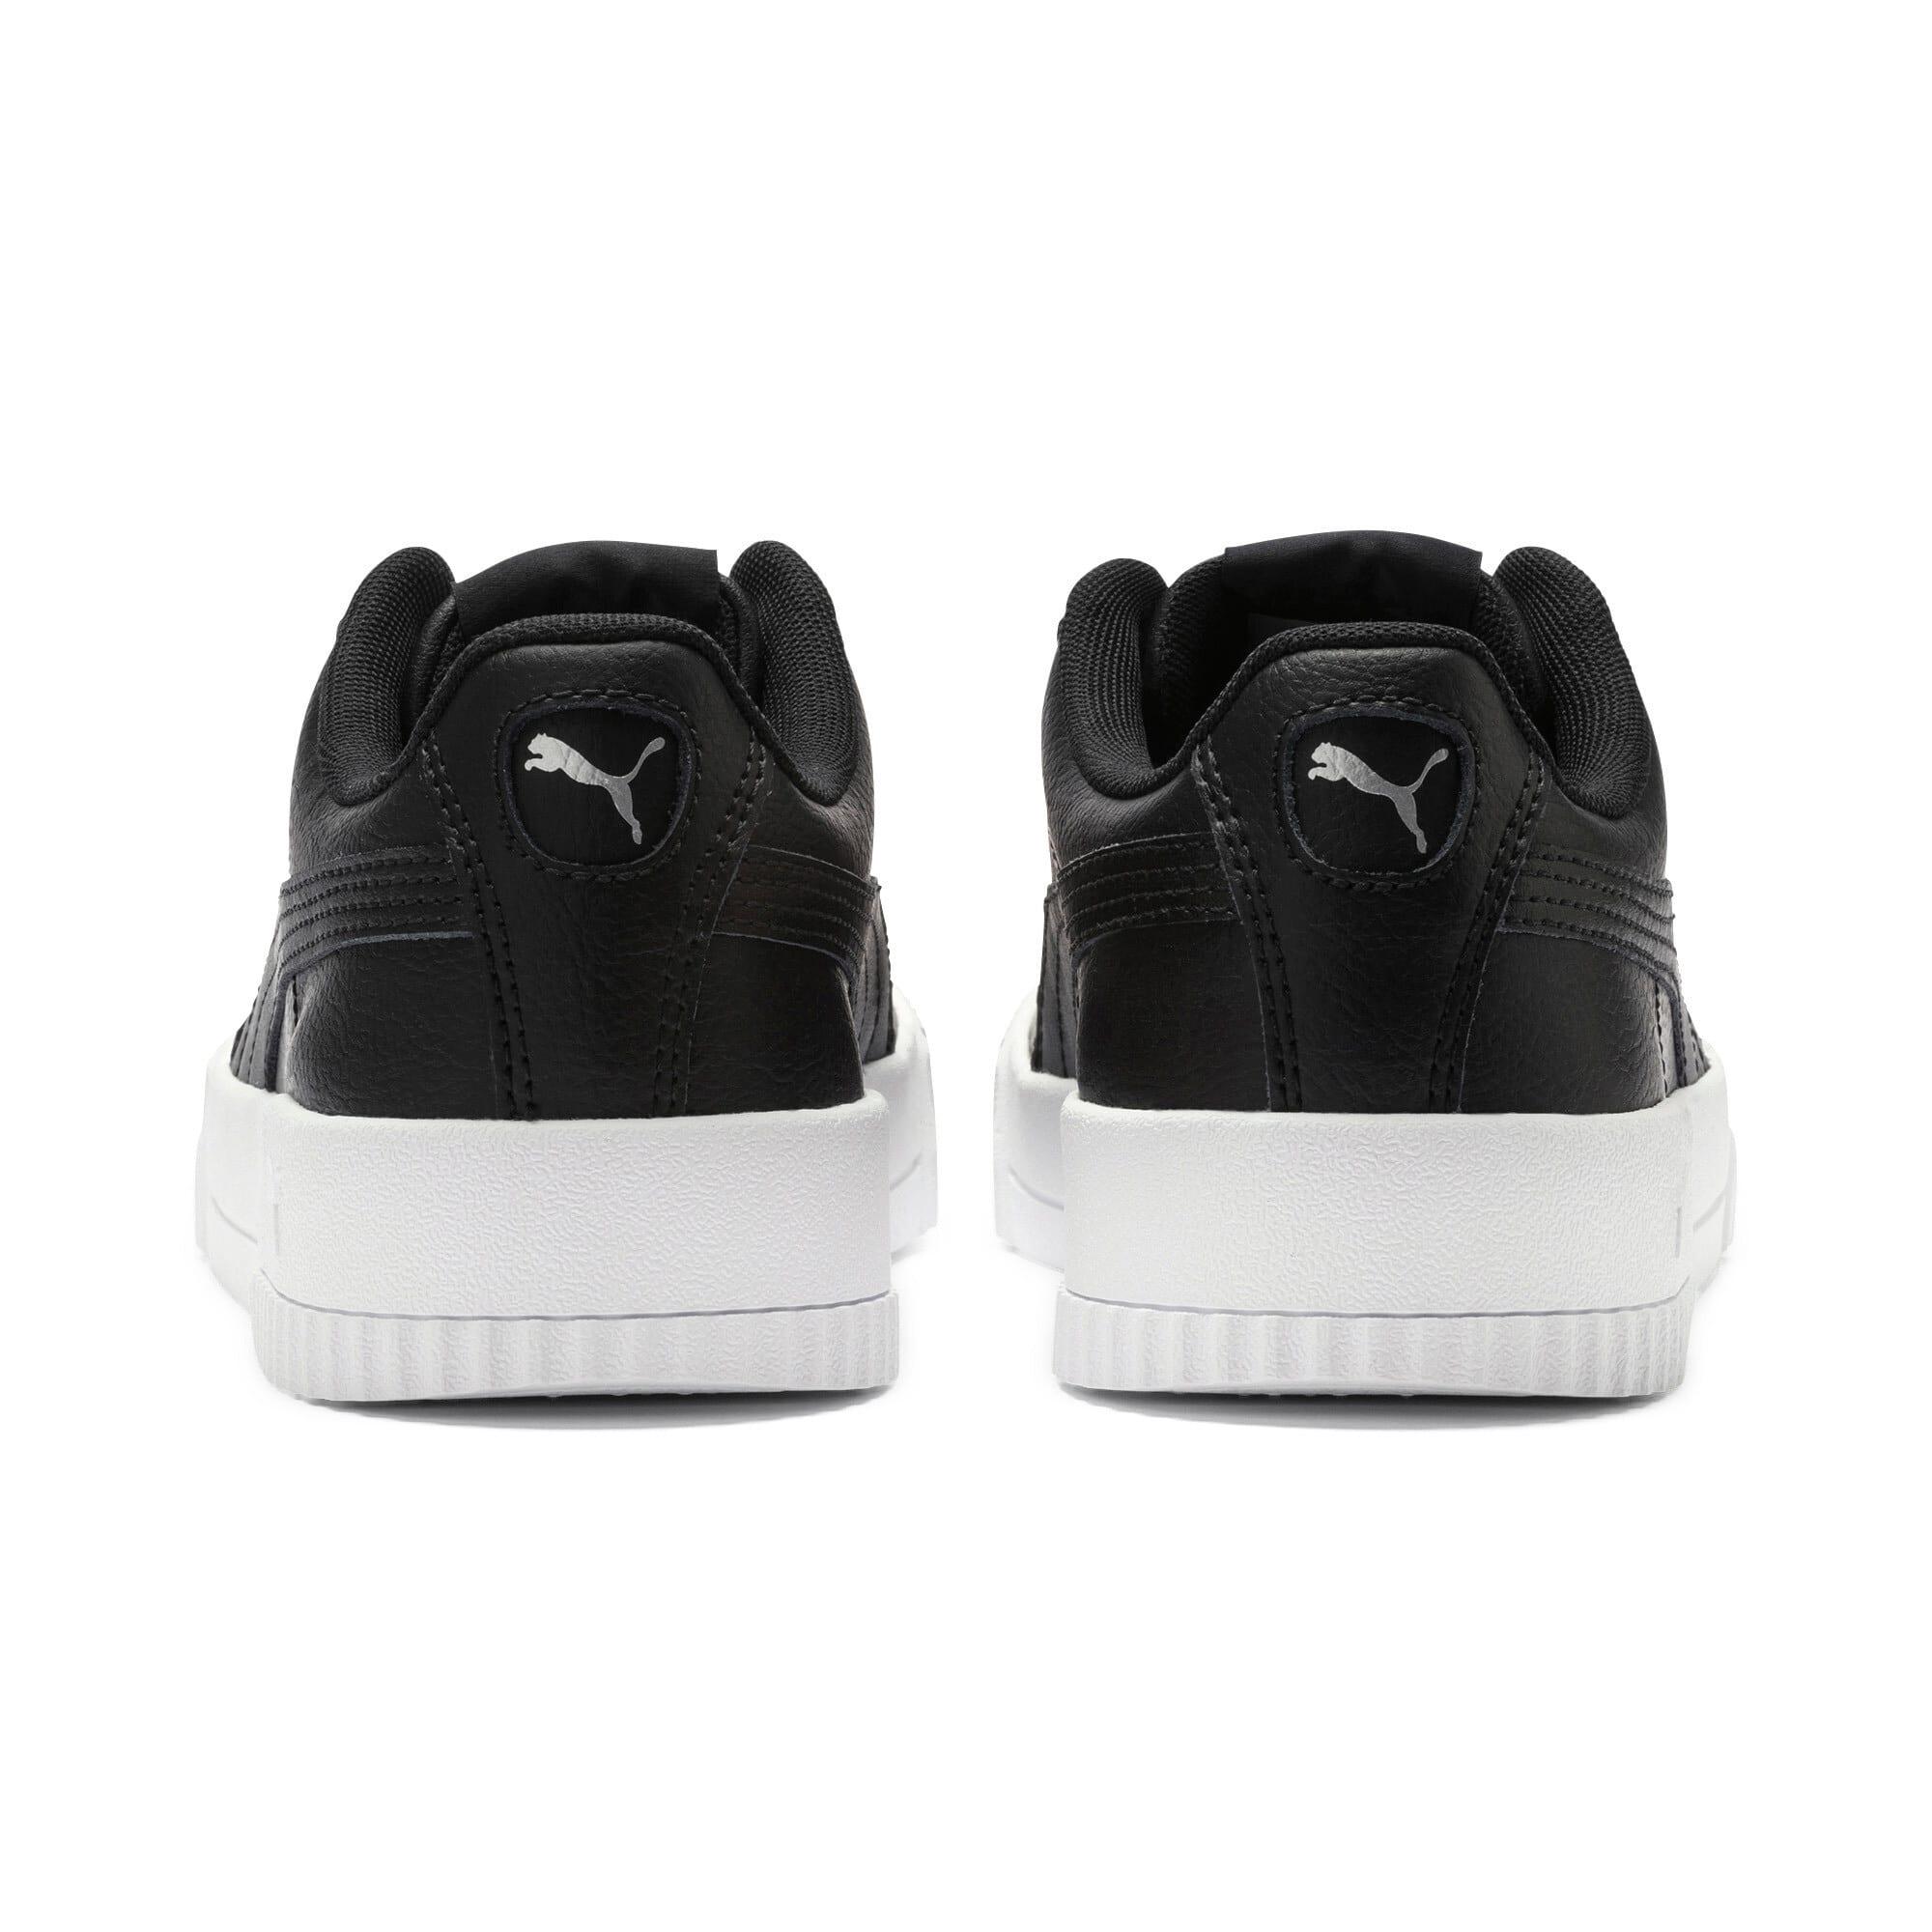 Thumbnail 4 of Carina Leather Women's Sneakers, Puma Black- White-Silver, medium